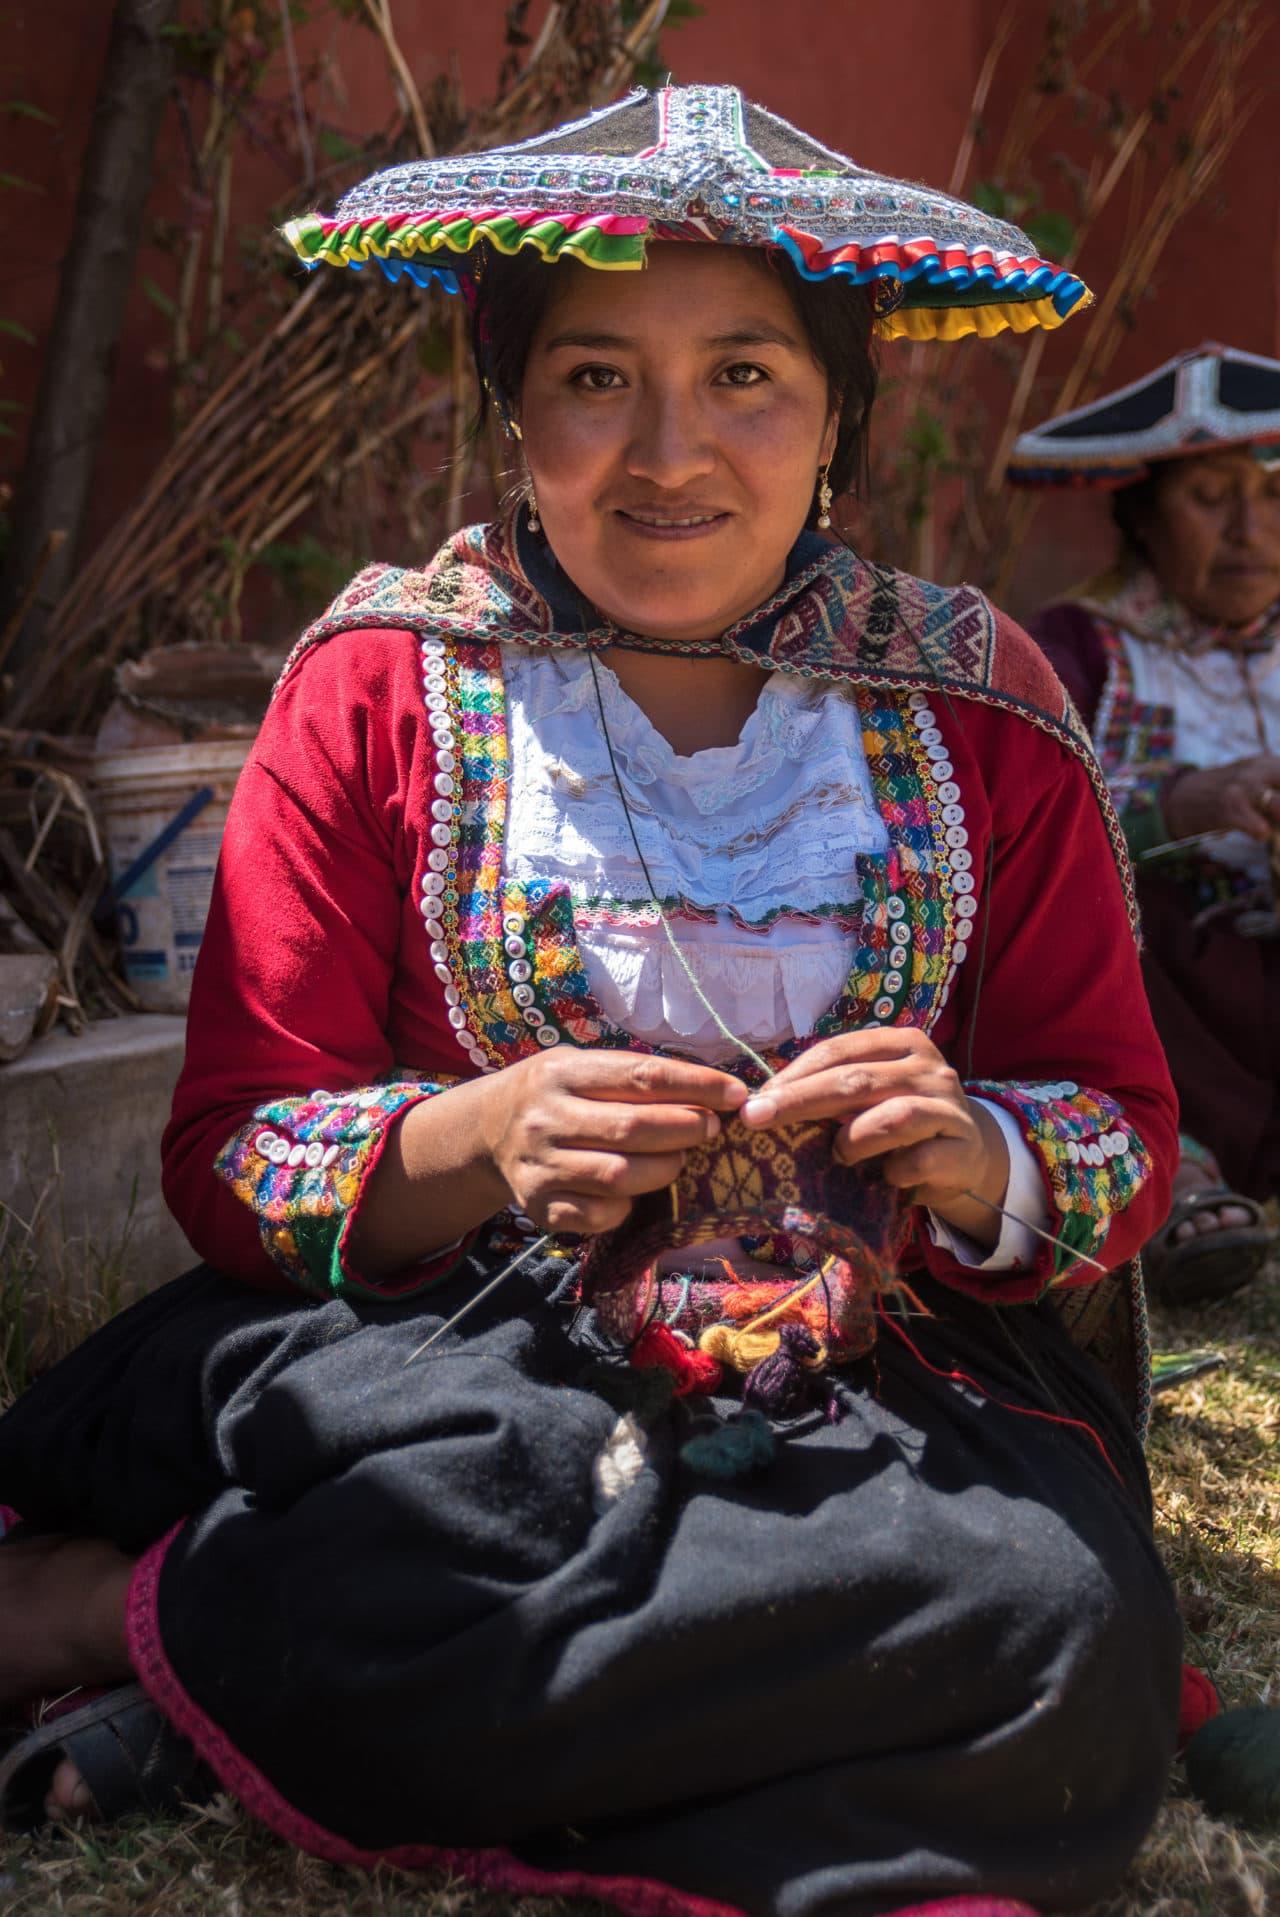 Pitumarca — Centro de Textiles Tradicionales Del Cusco, Peru (CTTC)